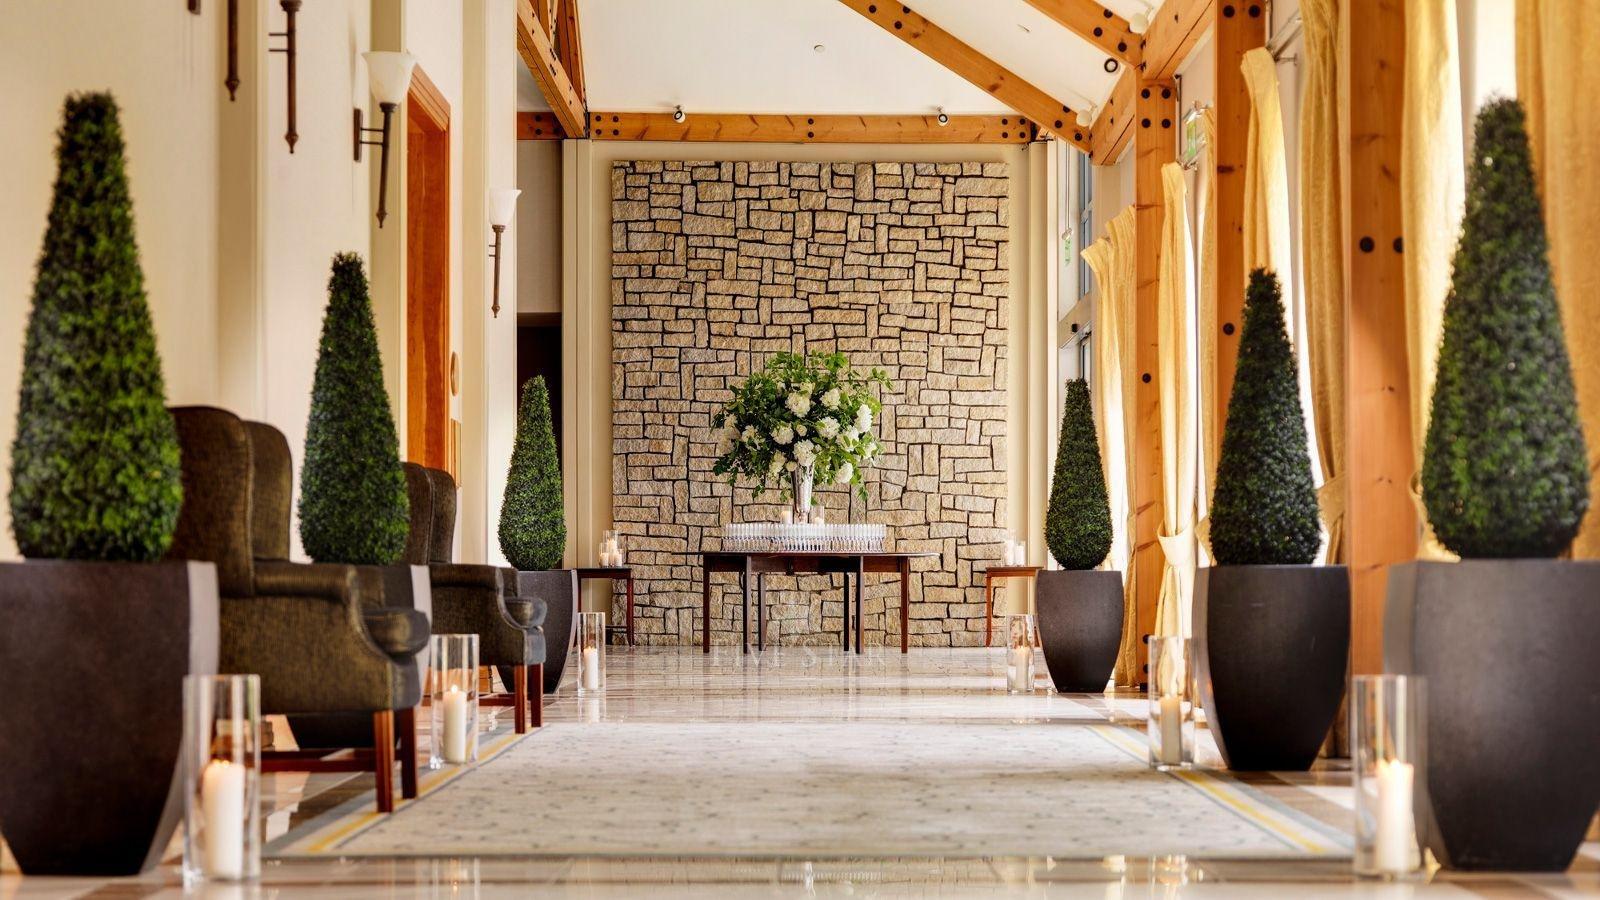 Druids Glen Hotel & Golf Resort photo 6